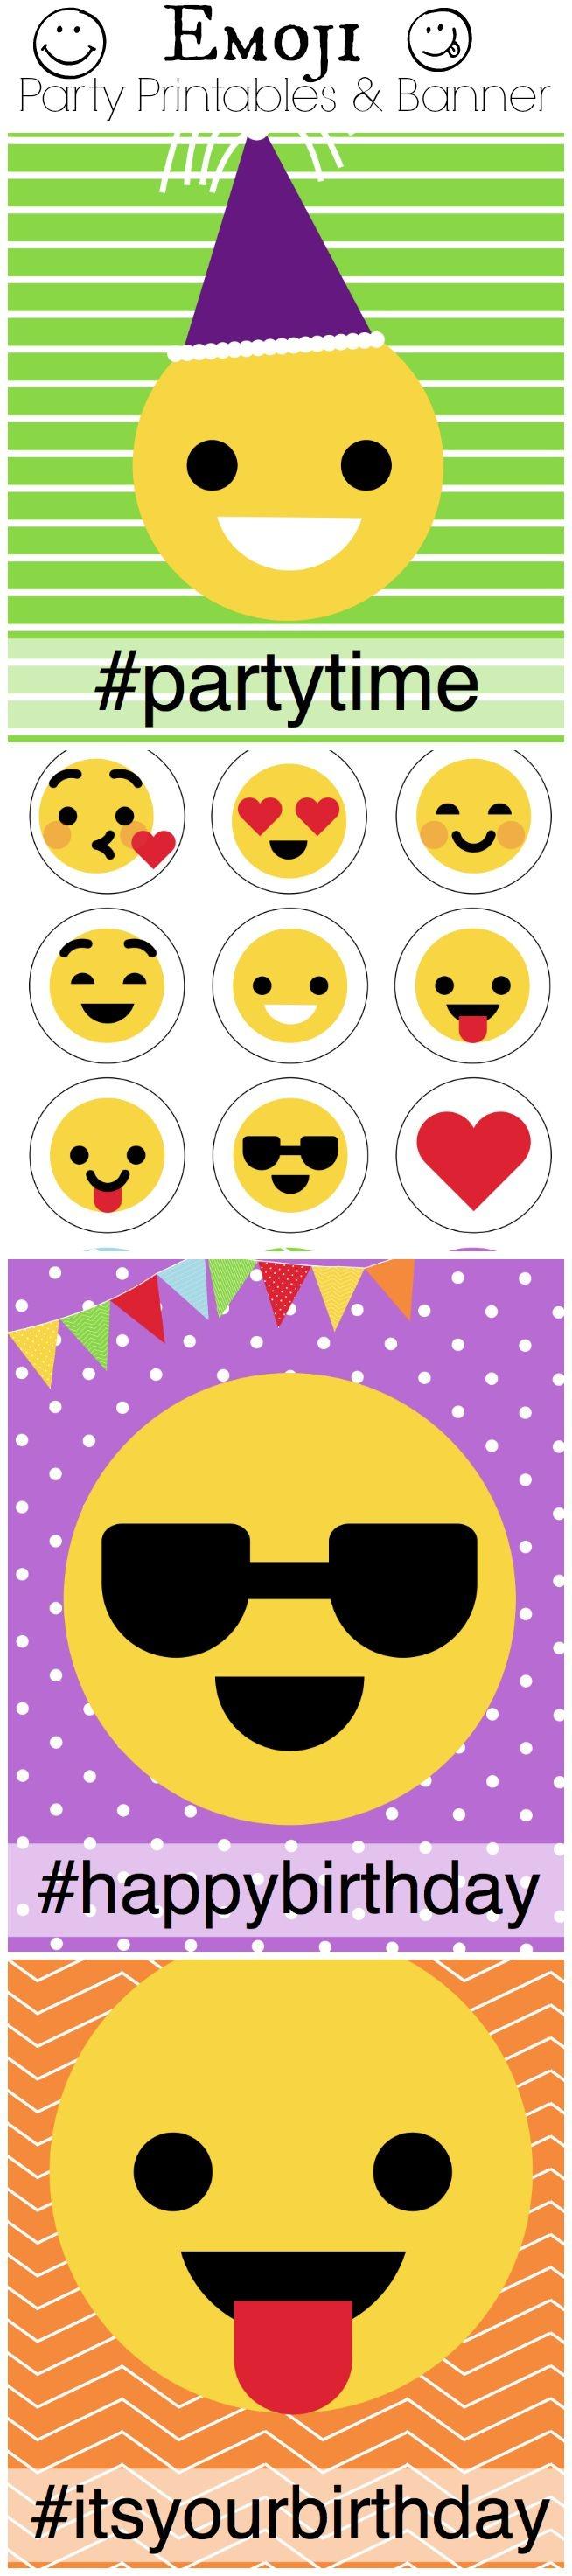 Emoji Birthday Party - Capturing Joy With Kristen Duke - Free Emoji Party Printables